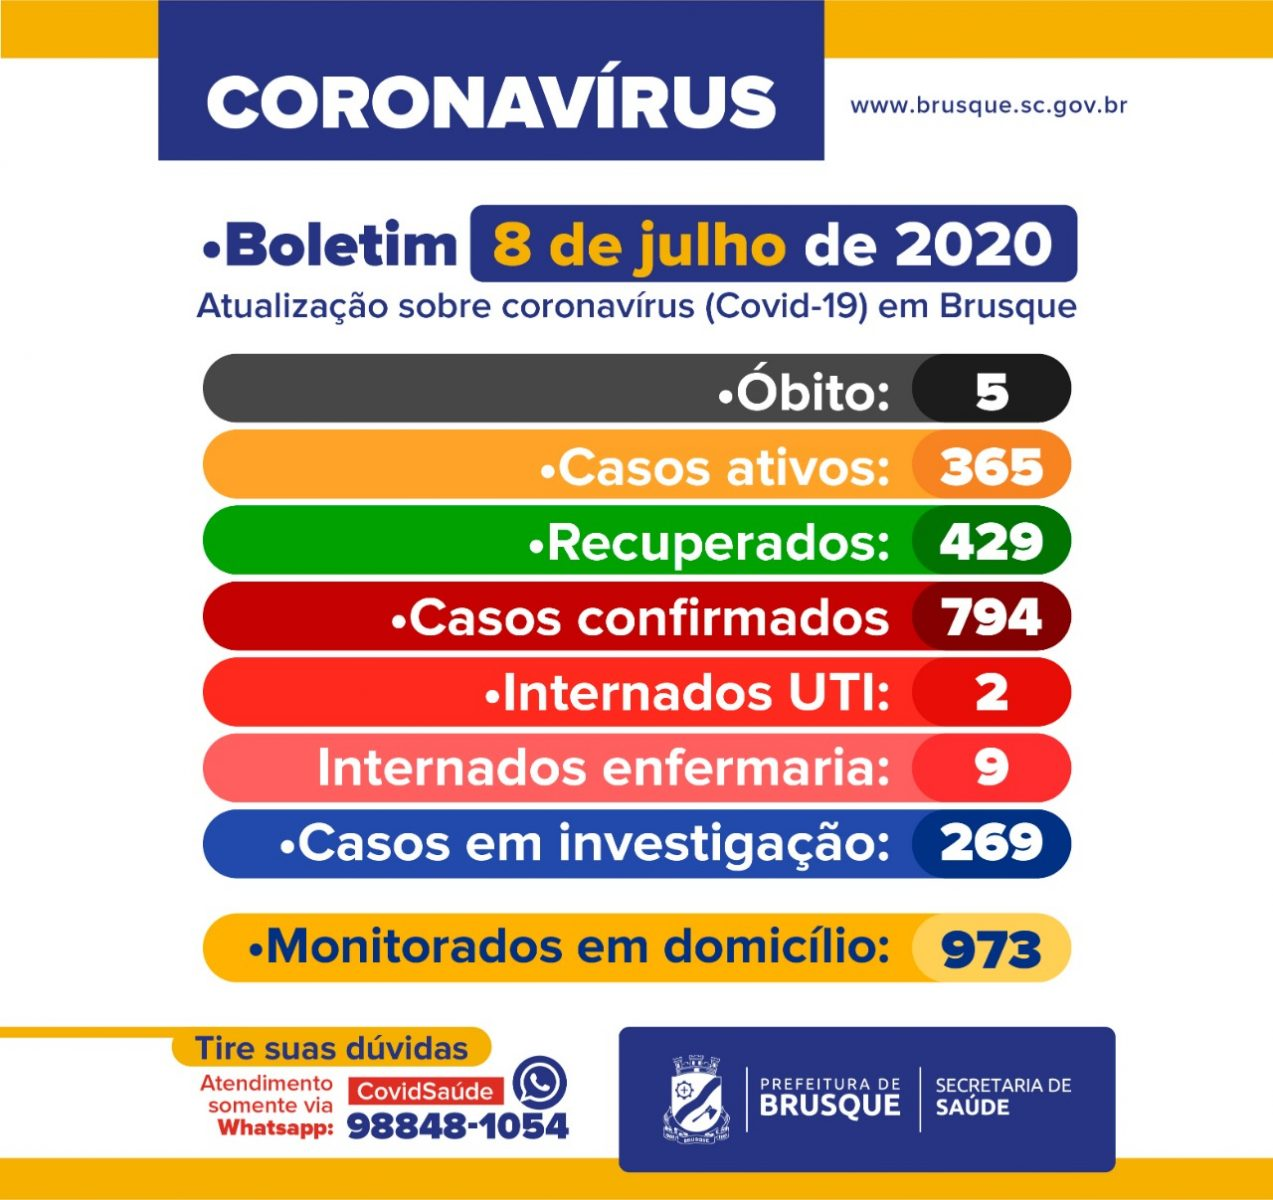 Brusque registra 79 novos casos de Covid-19